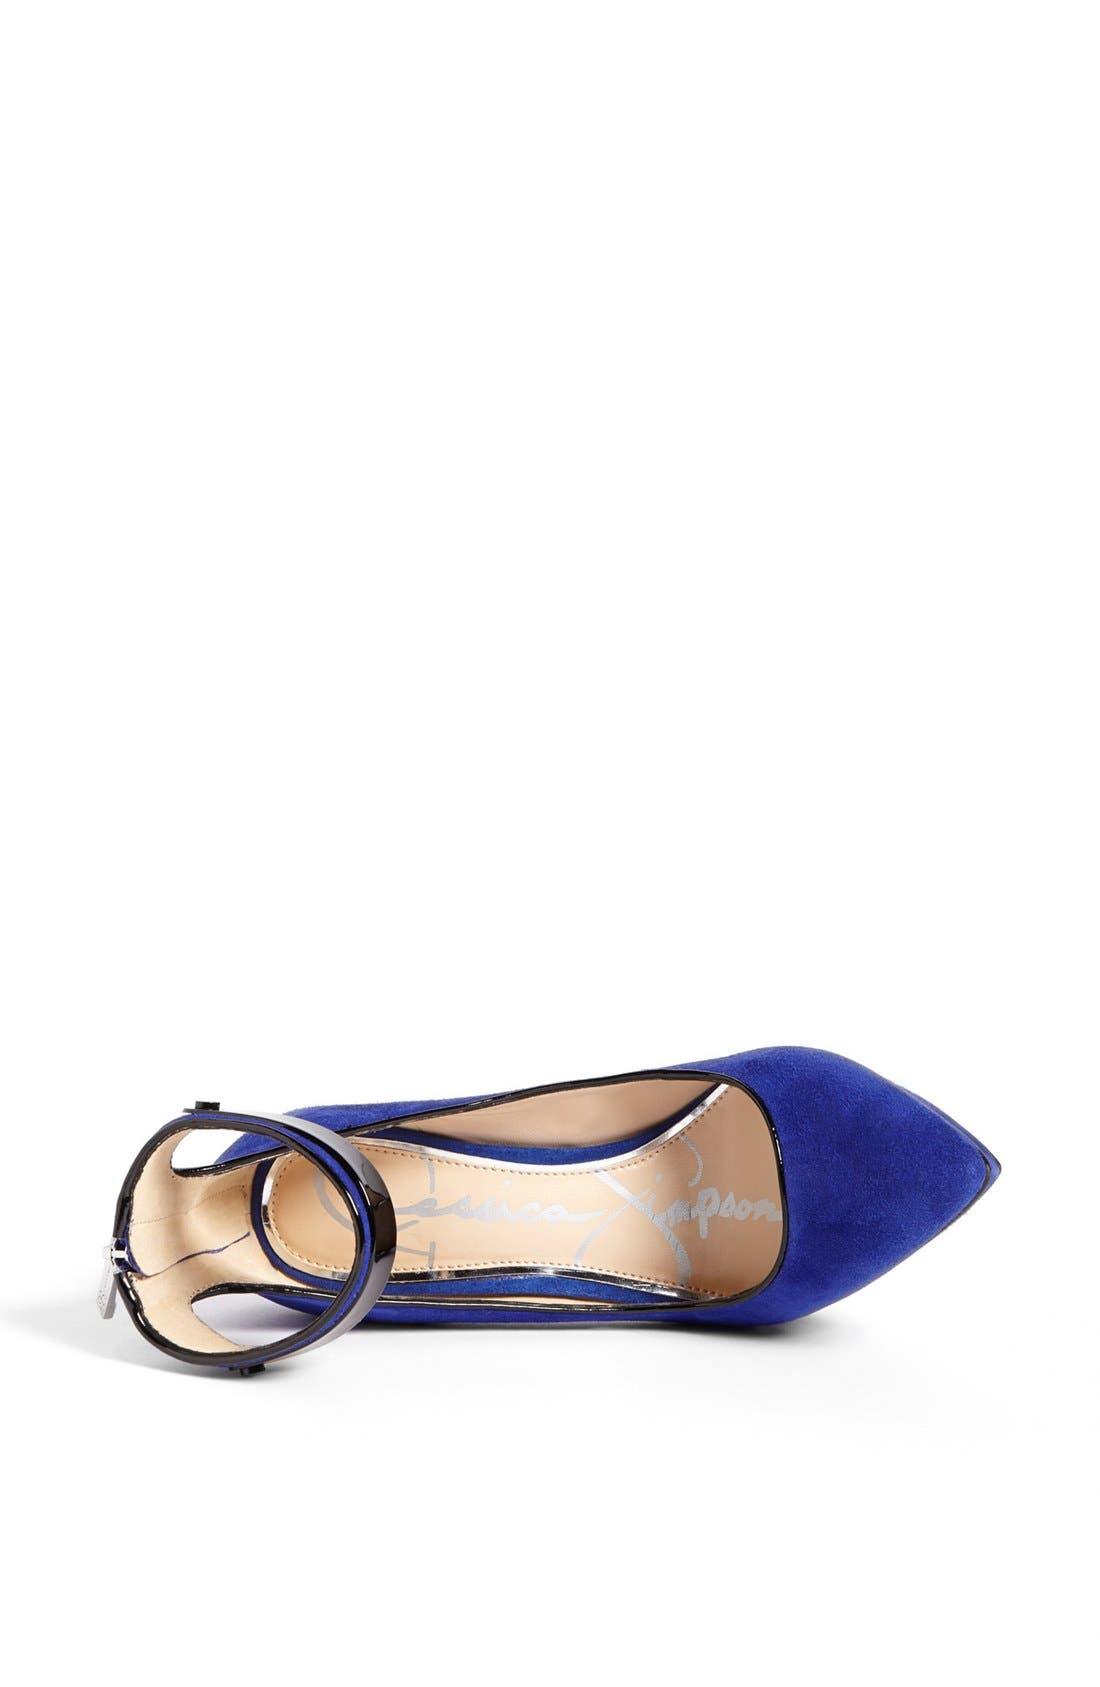 Alternate Image 3  - Jessica Simpson 'Violla' Ankle Strap Pointy Toe Pump